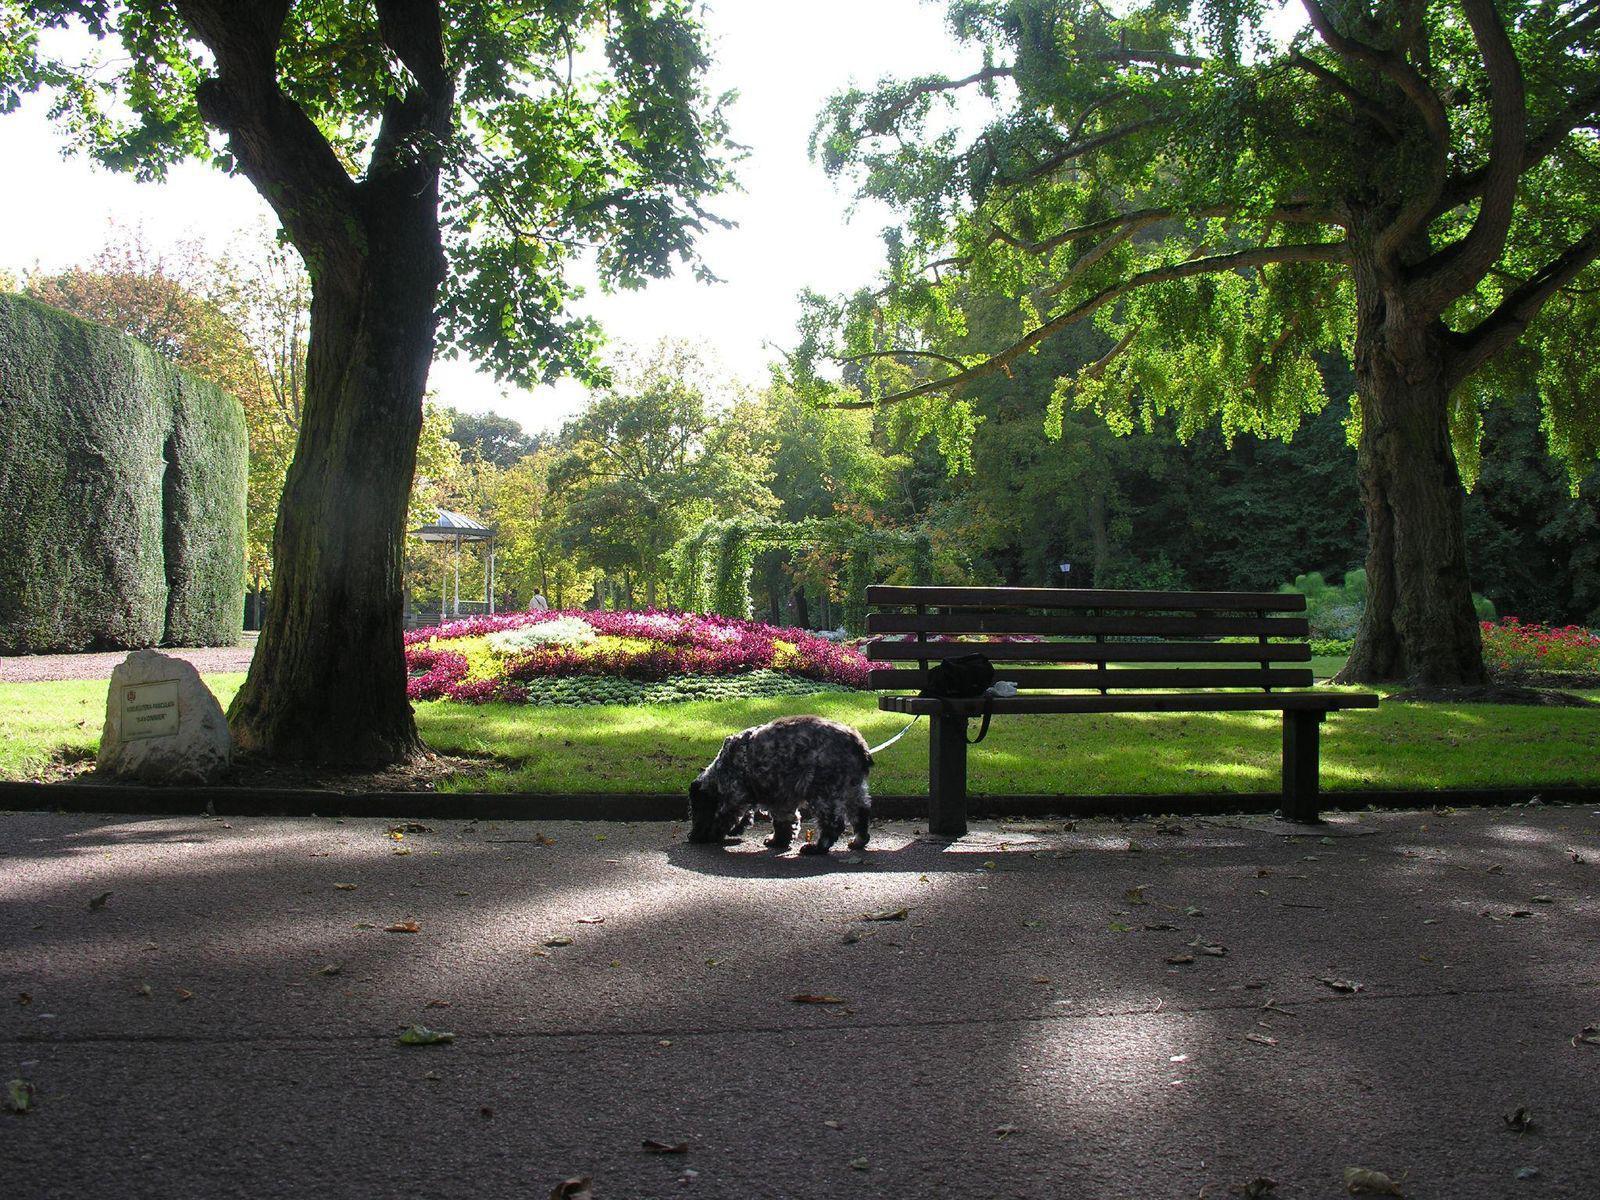 Jardin public de saint omer saint omer 62500 pas de for Jardin public